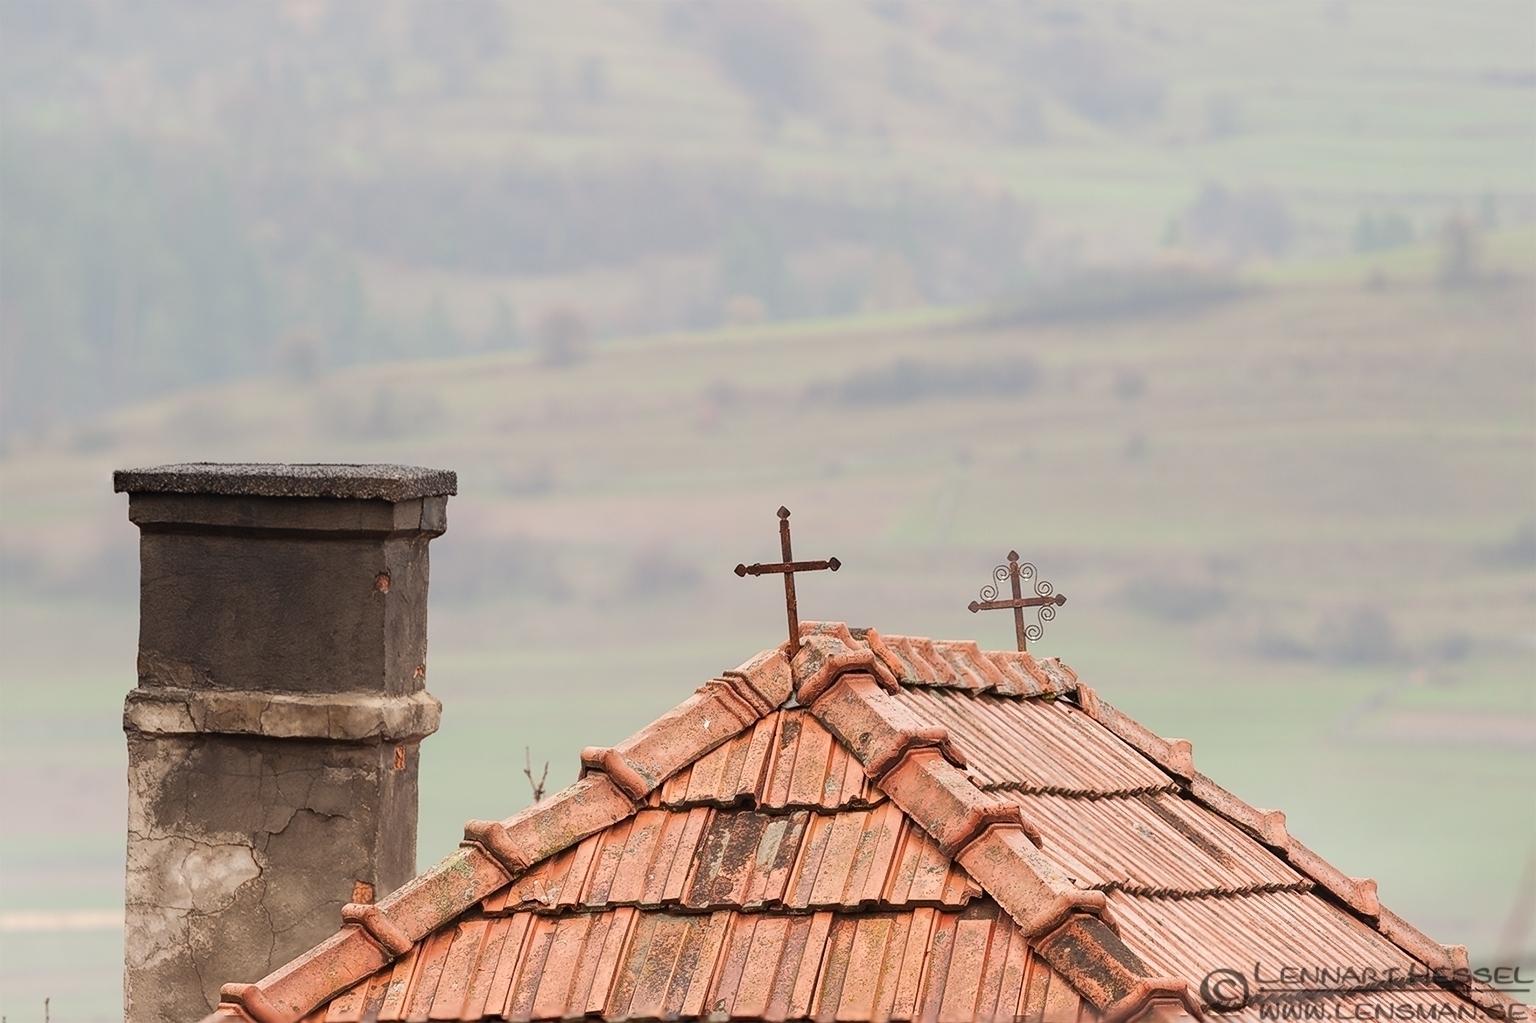 Roof Transylvania, Romania